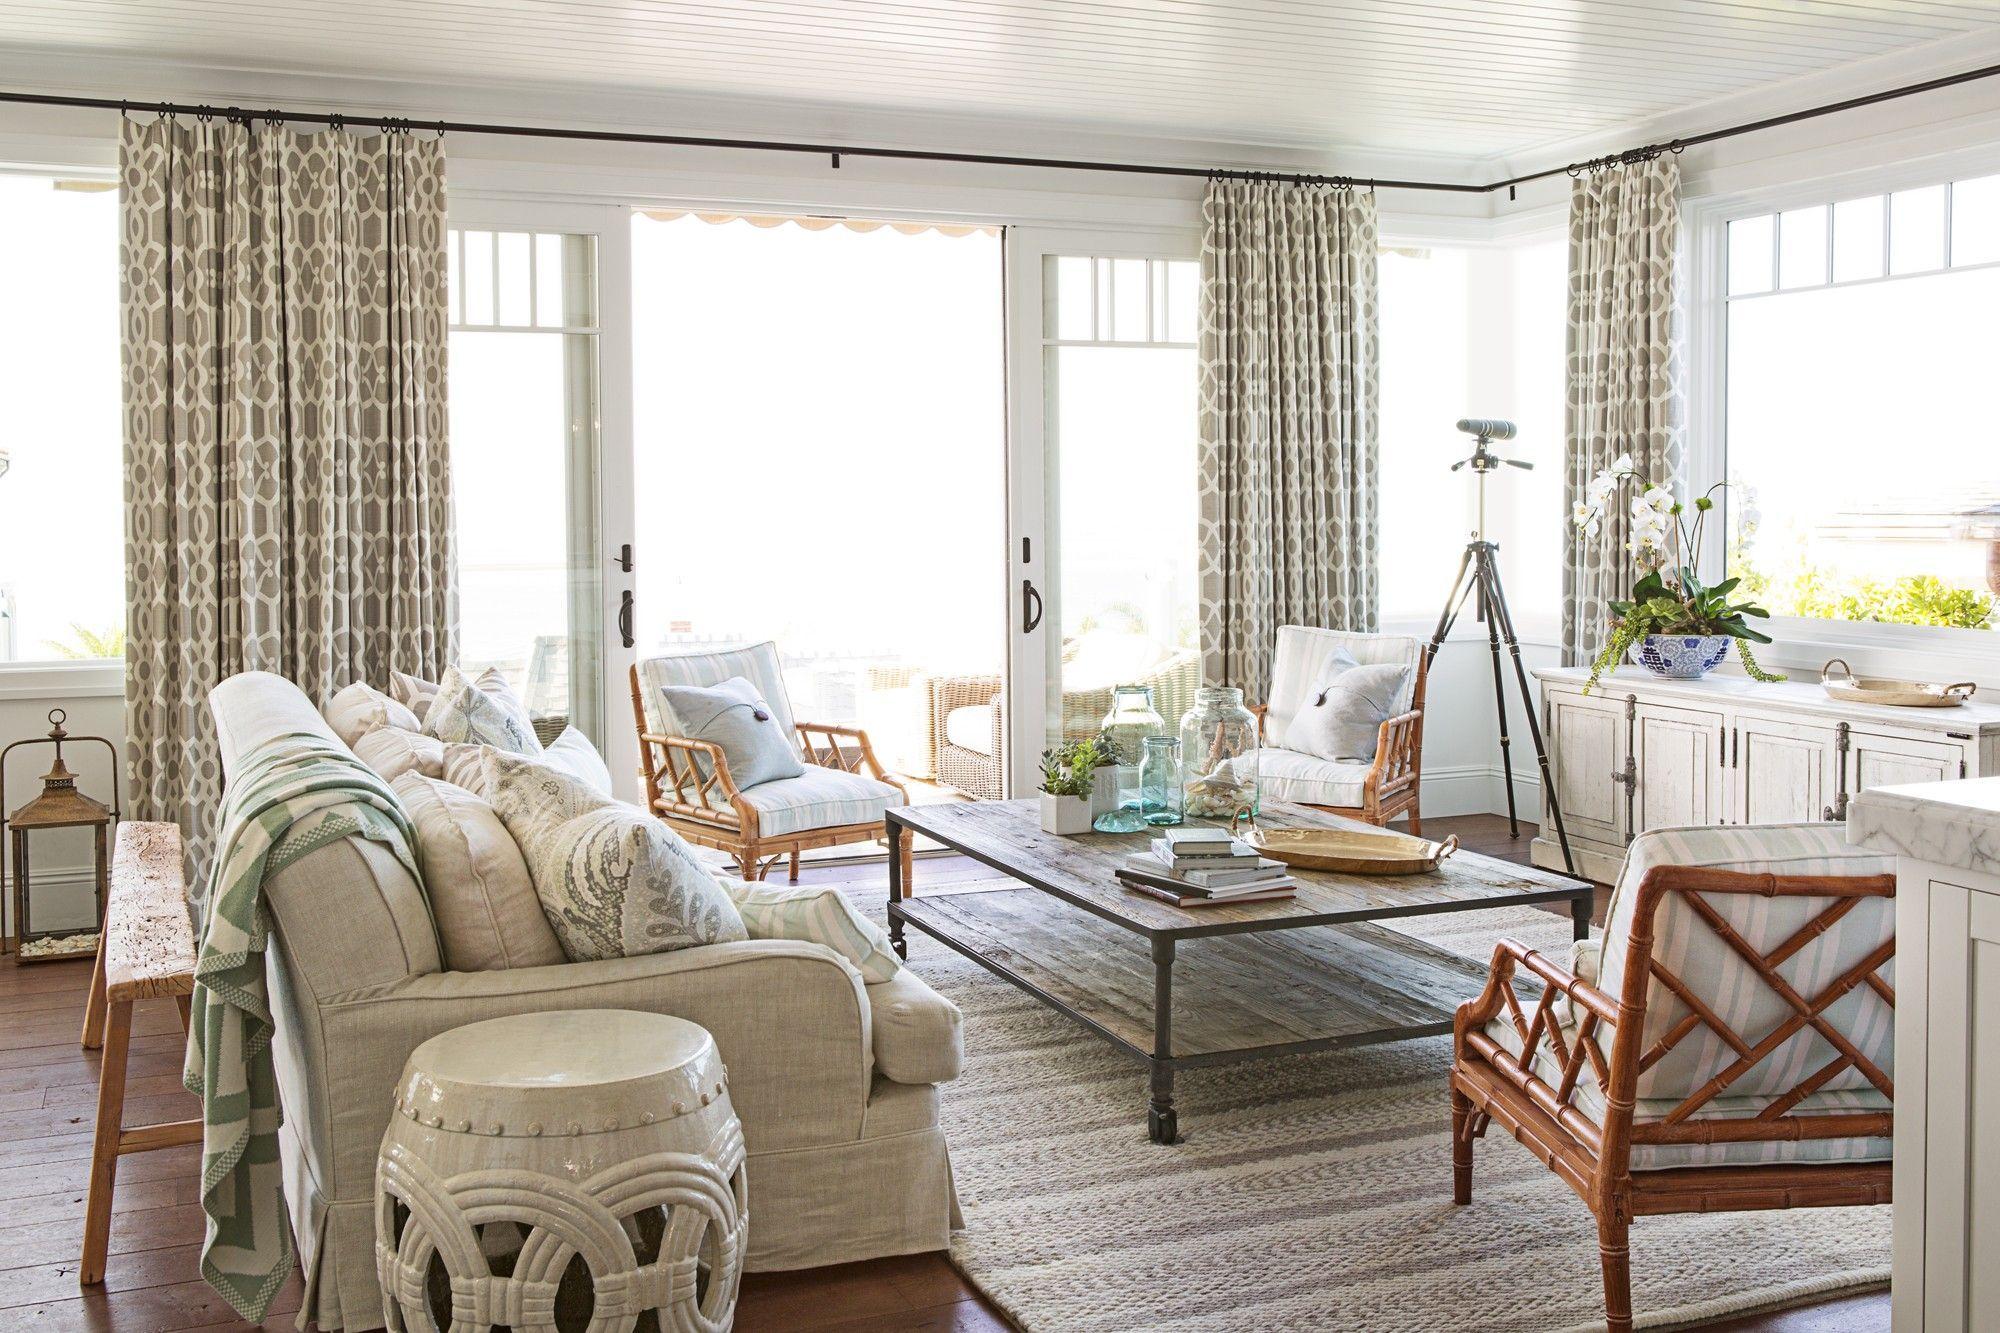 50 cozy rustic coastal living room ideas